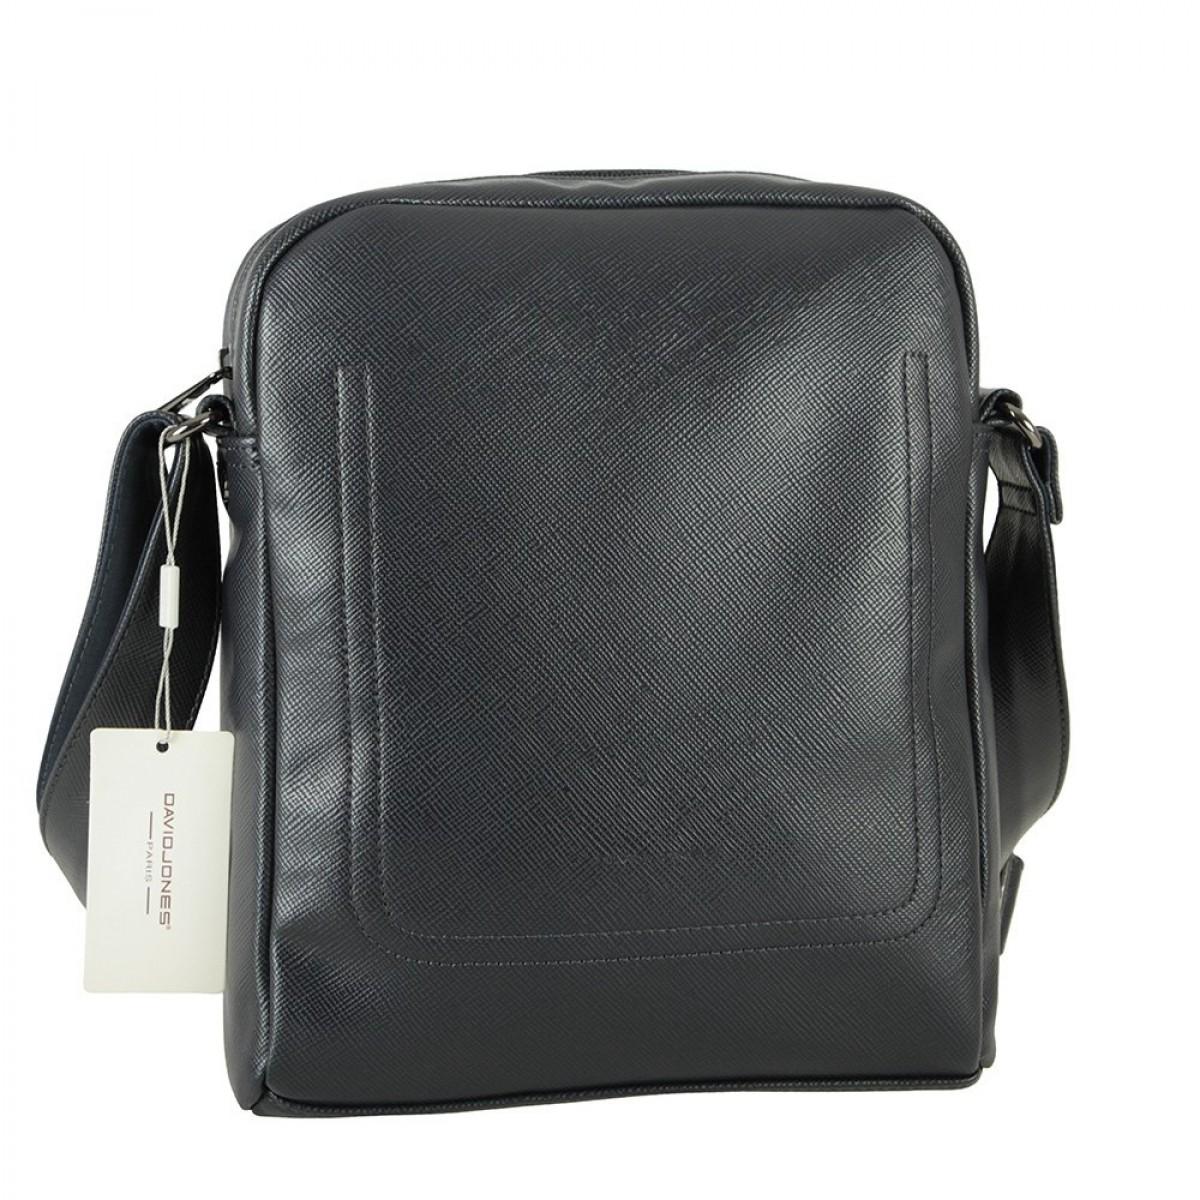 Жіноча сумка David Jones 688802 D.BLUE